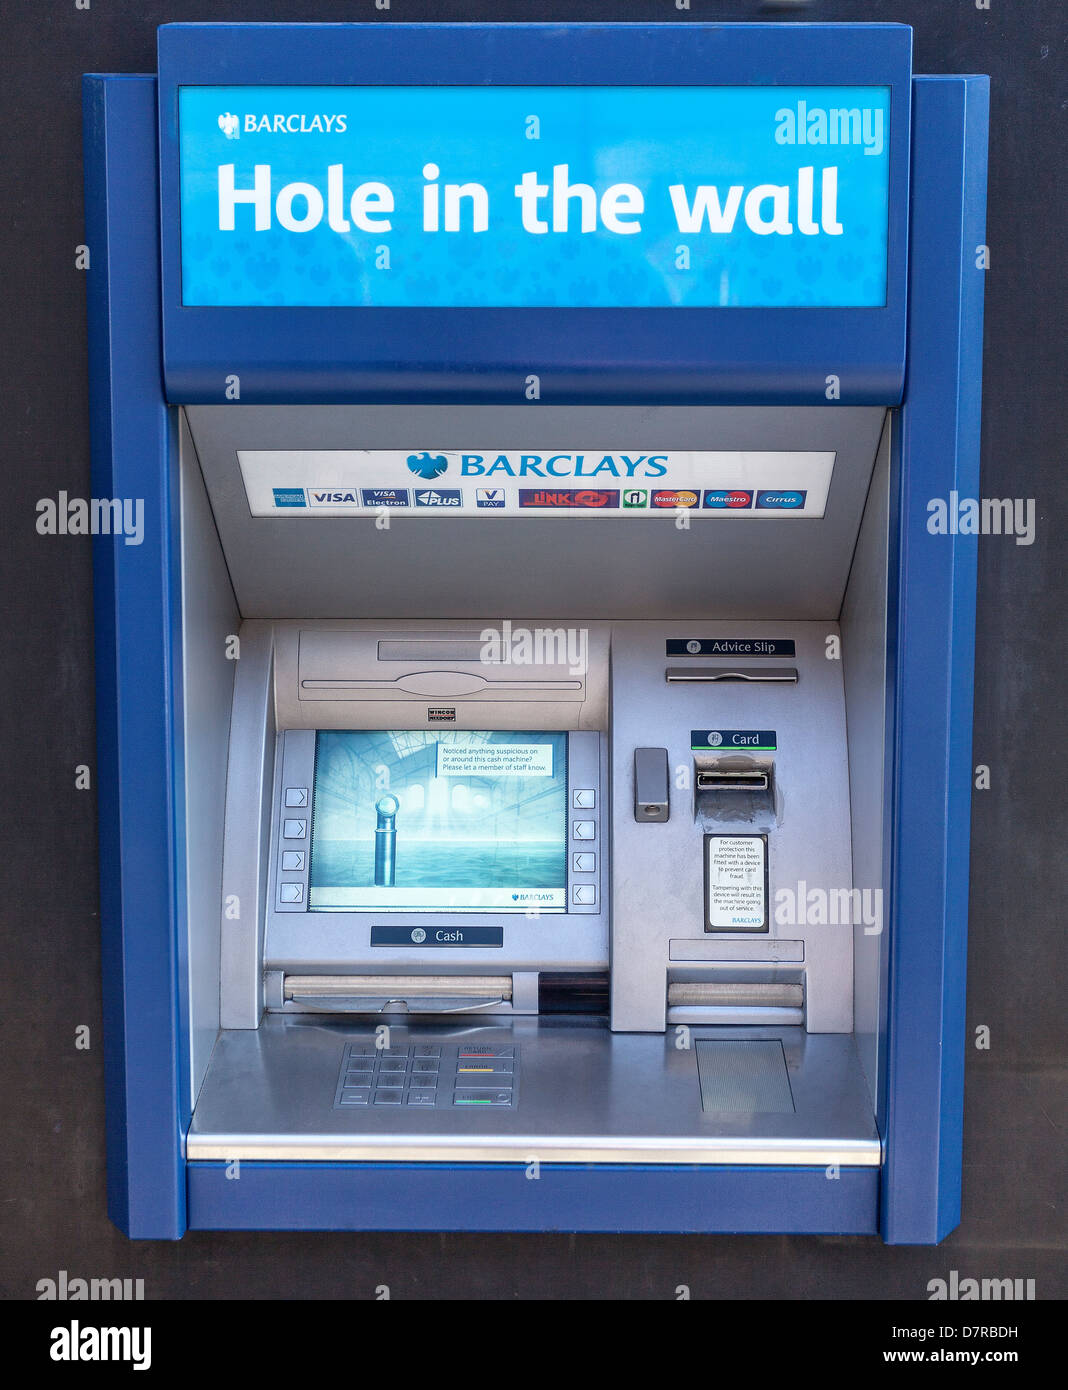 ATM cashpoint Machine - Stock Image